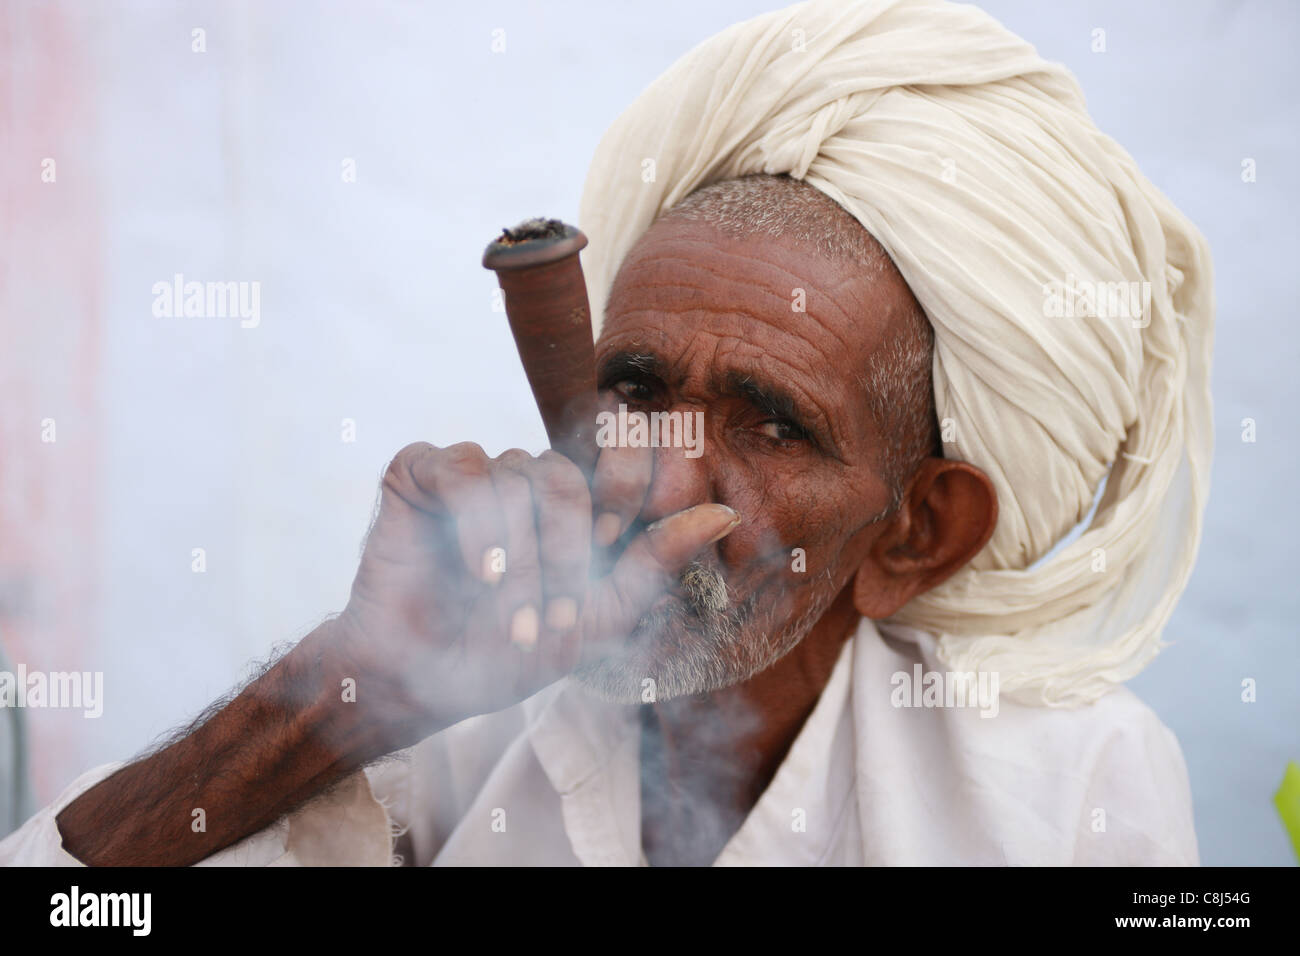 Ganja, Pushkar, Rajasthan, India, Asia, holy man, yogi, ascet, ascetic, ashram, pilgrim, ashes, turban, flower, - Stock Image